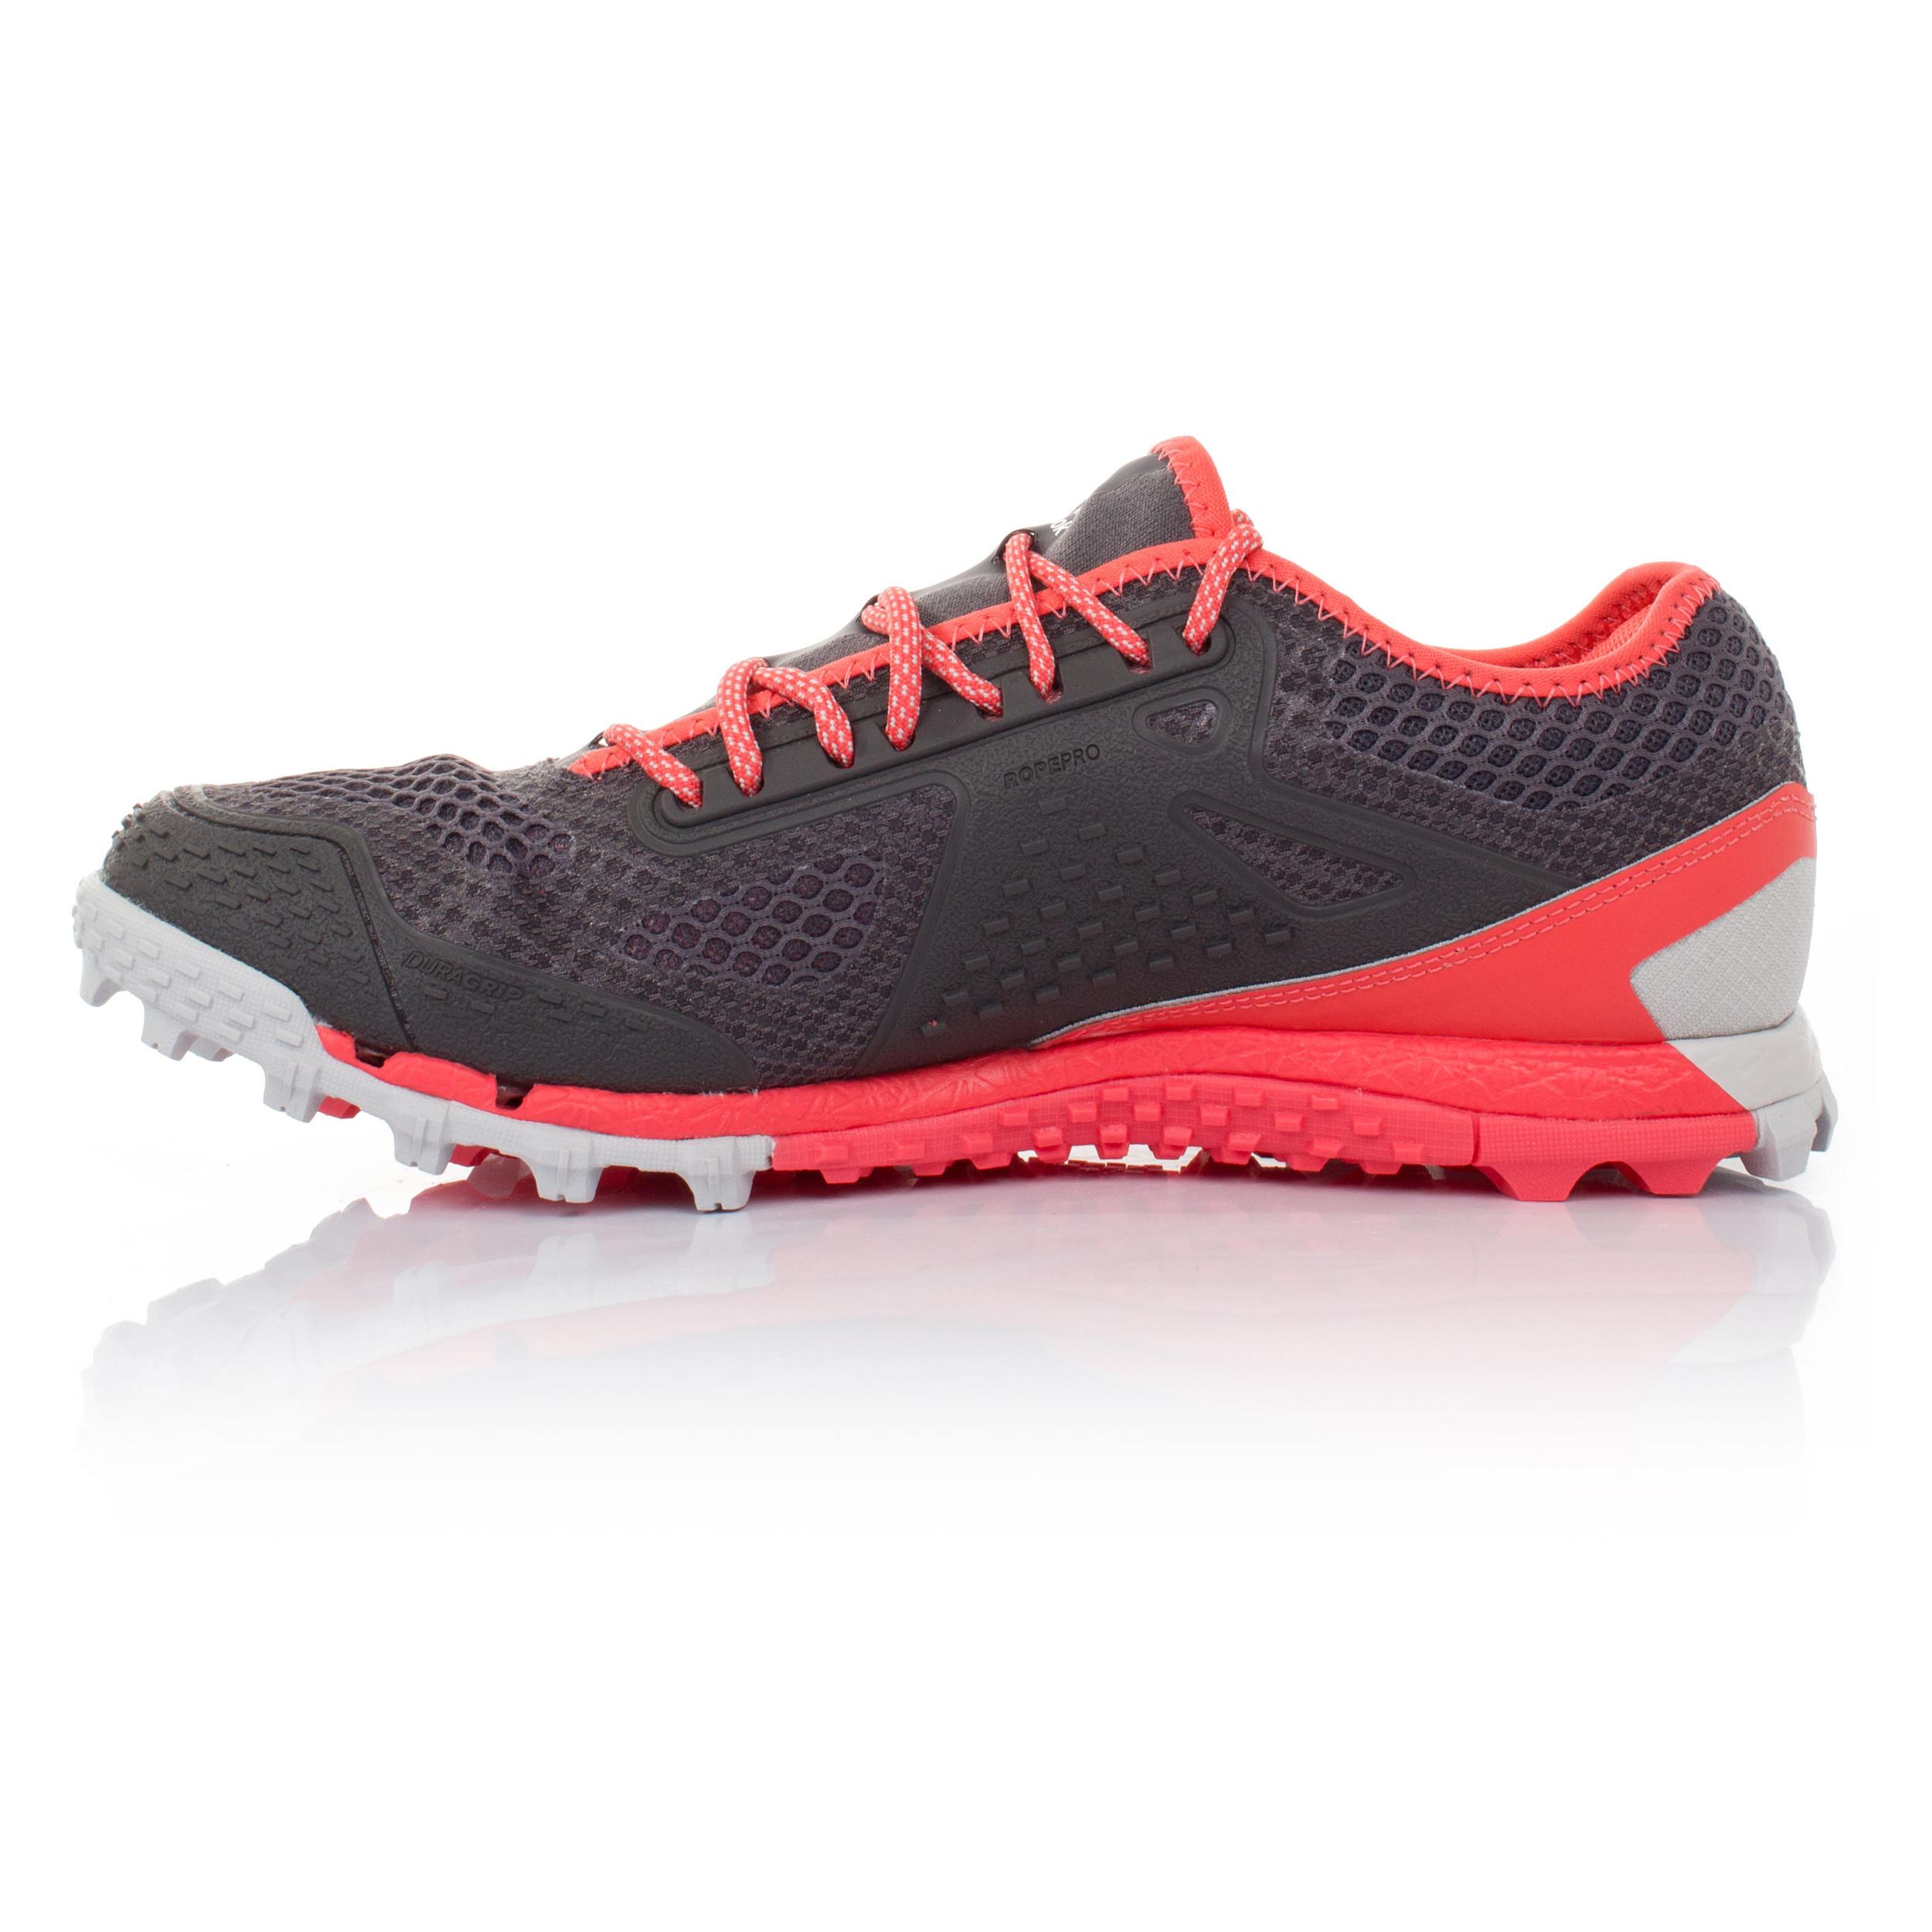 Reebok All Terrain Super Women S Trail Running Shoes